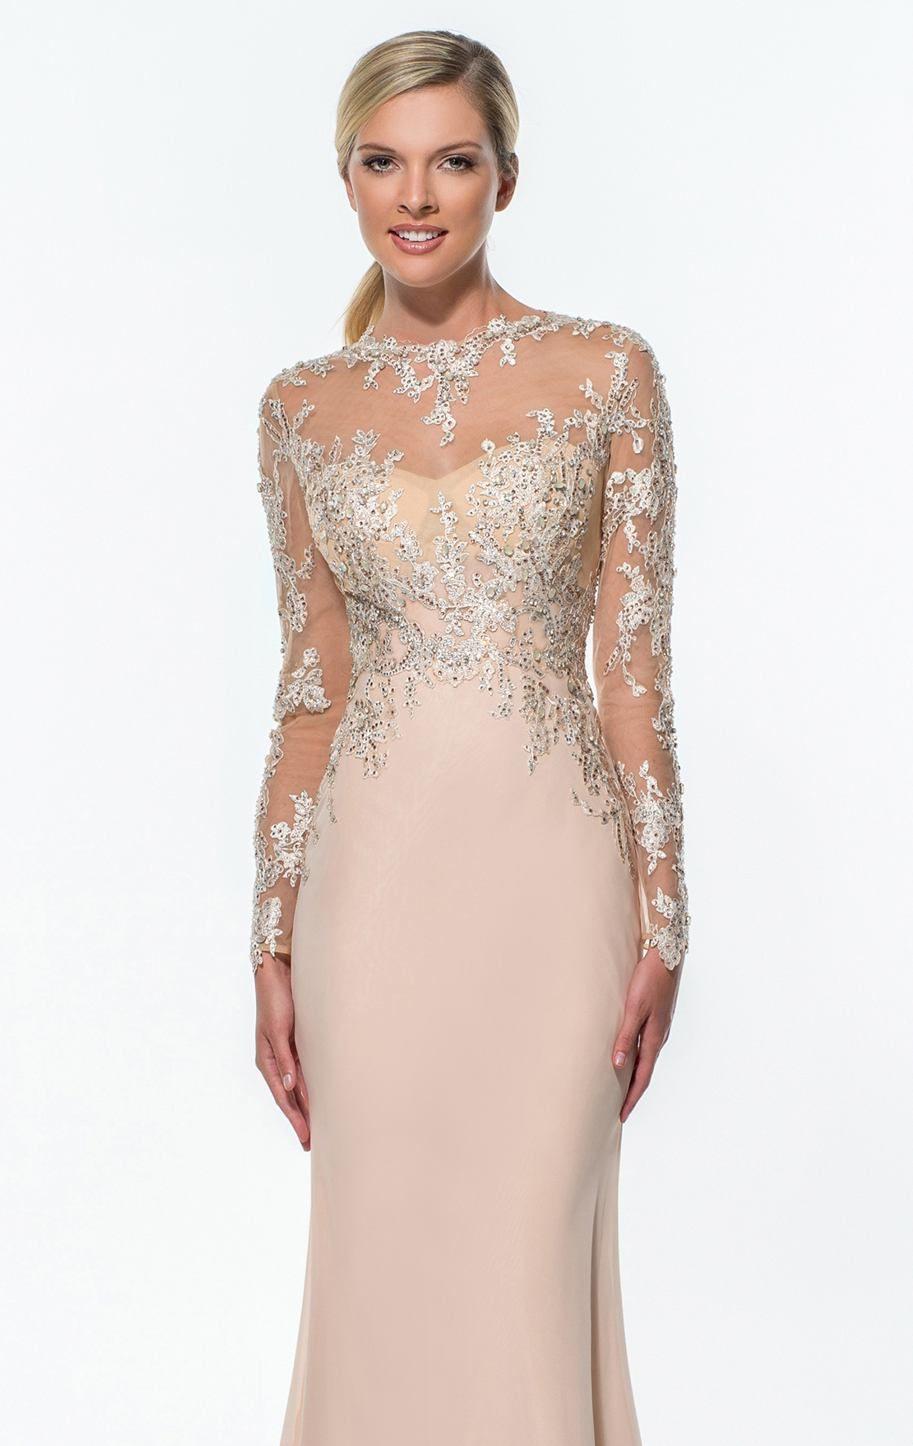 Formal Elegant Terani Couture Abendkleid GalerieFormal Ausgezeichnet Terani Couture Abendkleid Spezialgebiet